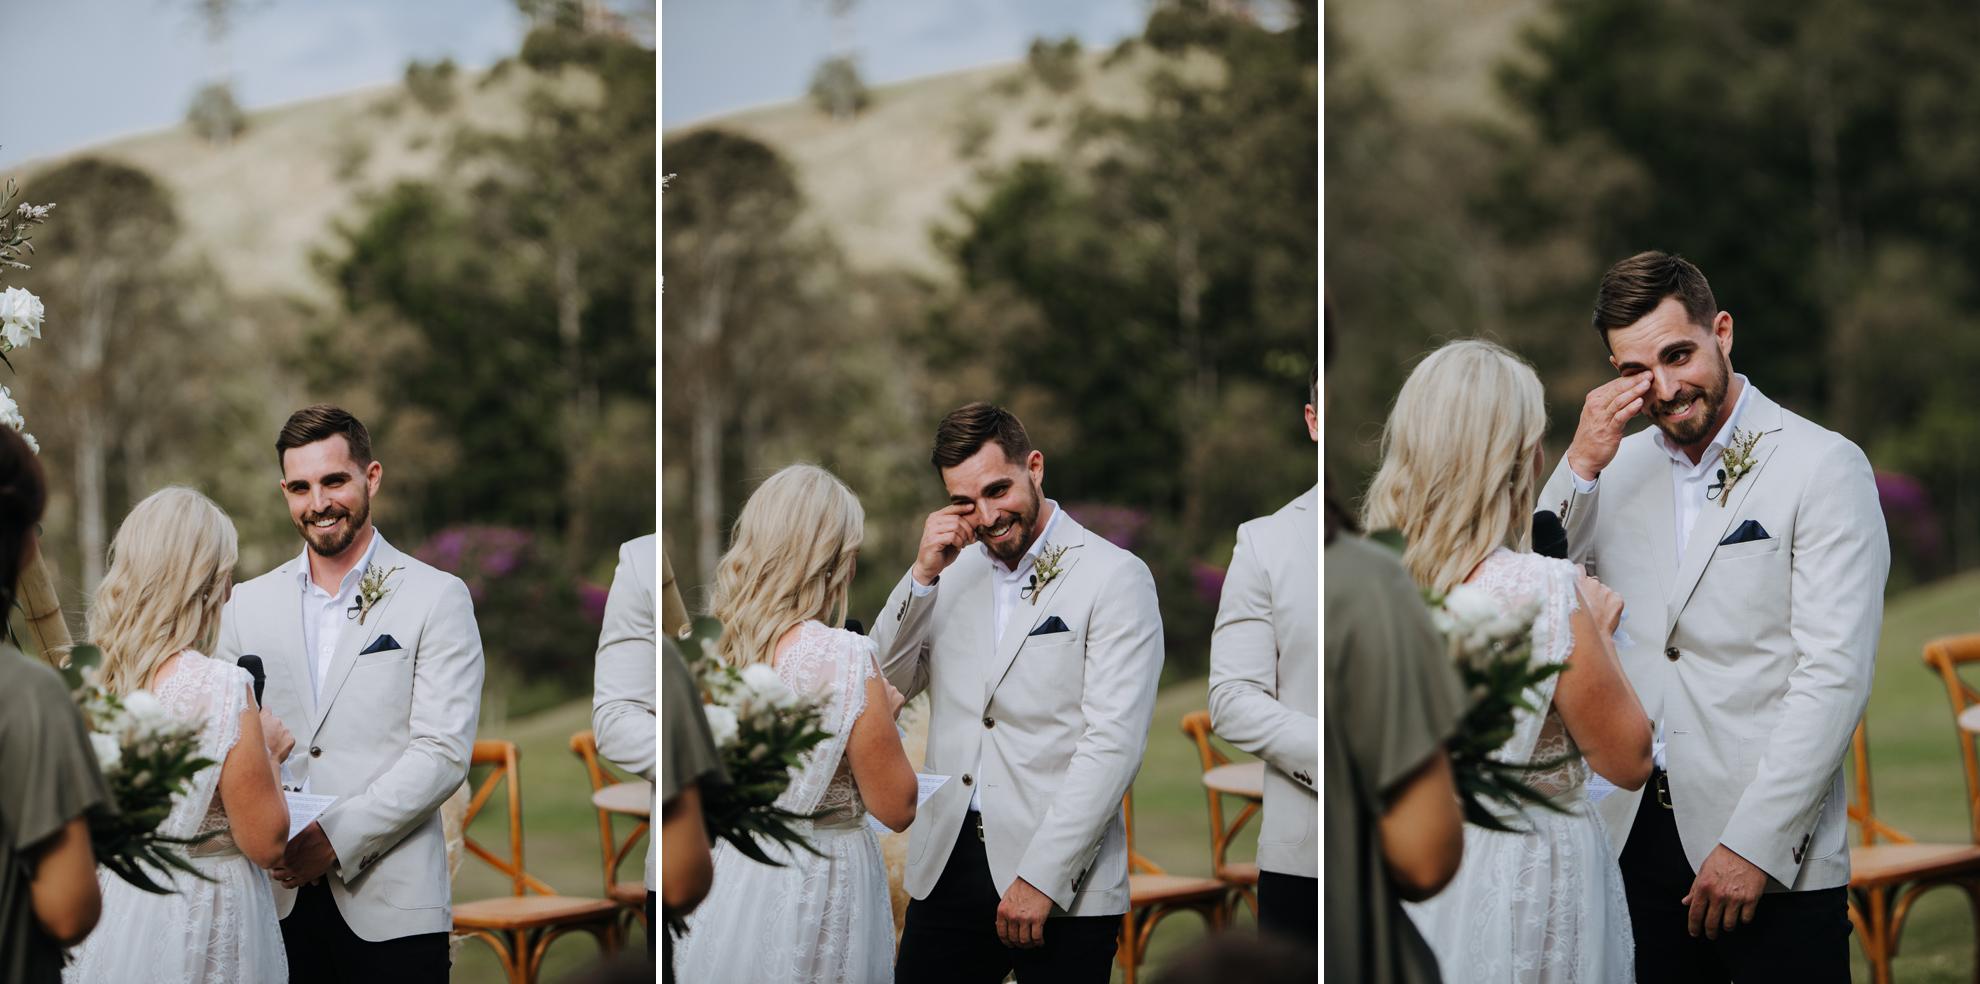 046-Kirby_Lewis_Maleny_Manor_Wedding.jpg